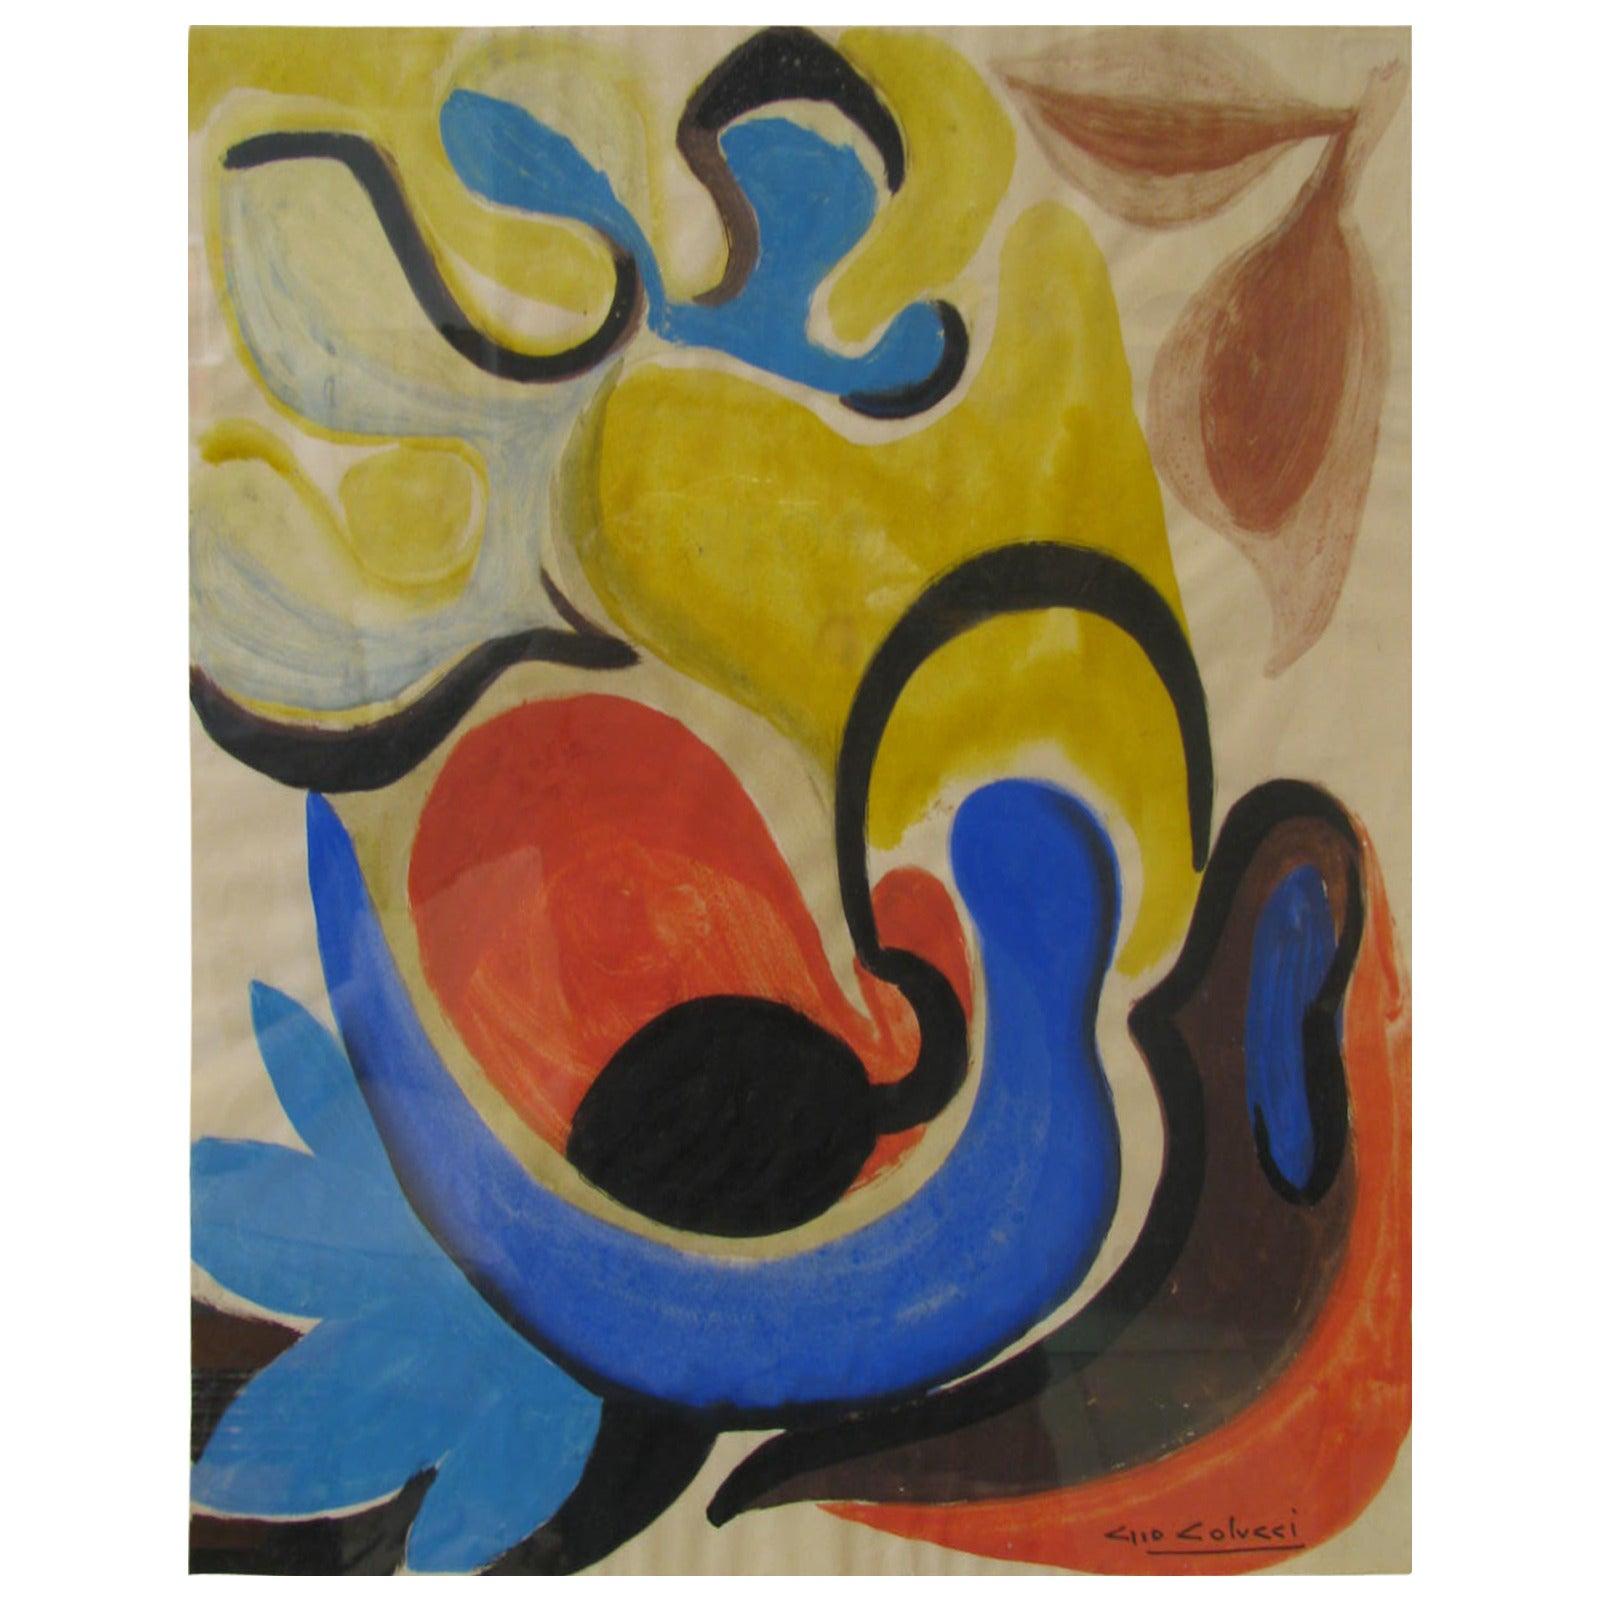 "Gio Colucci ""Composition Abstraite"" Painting, circa 1955"